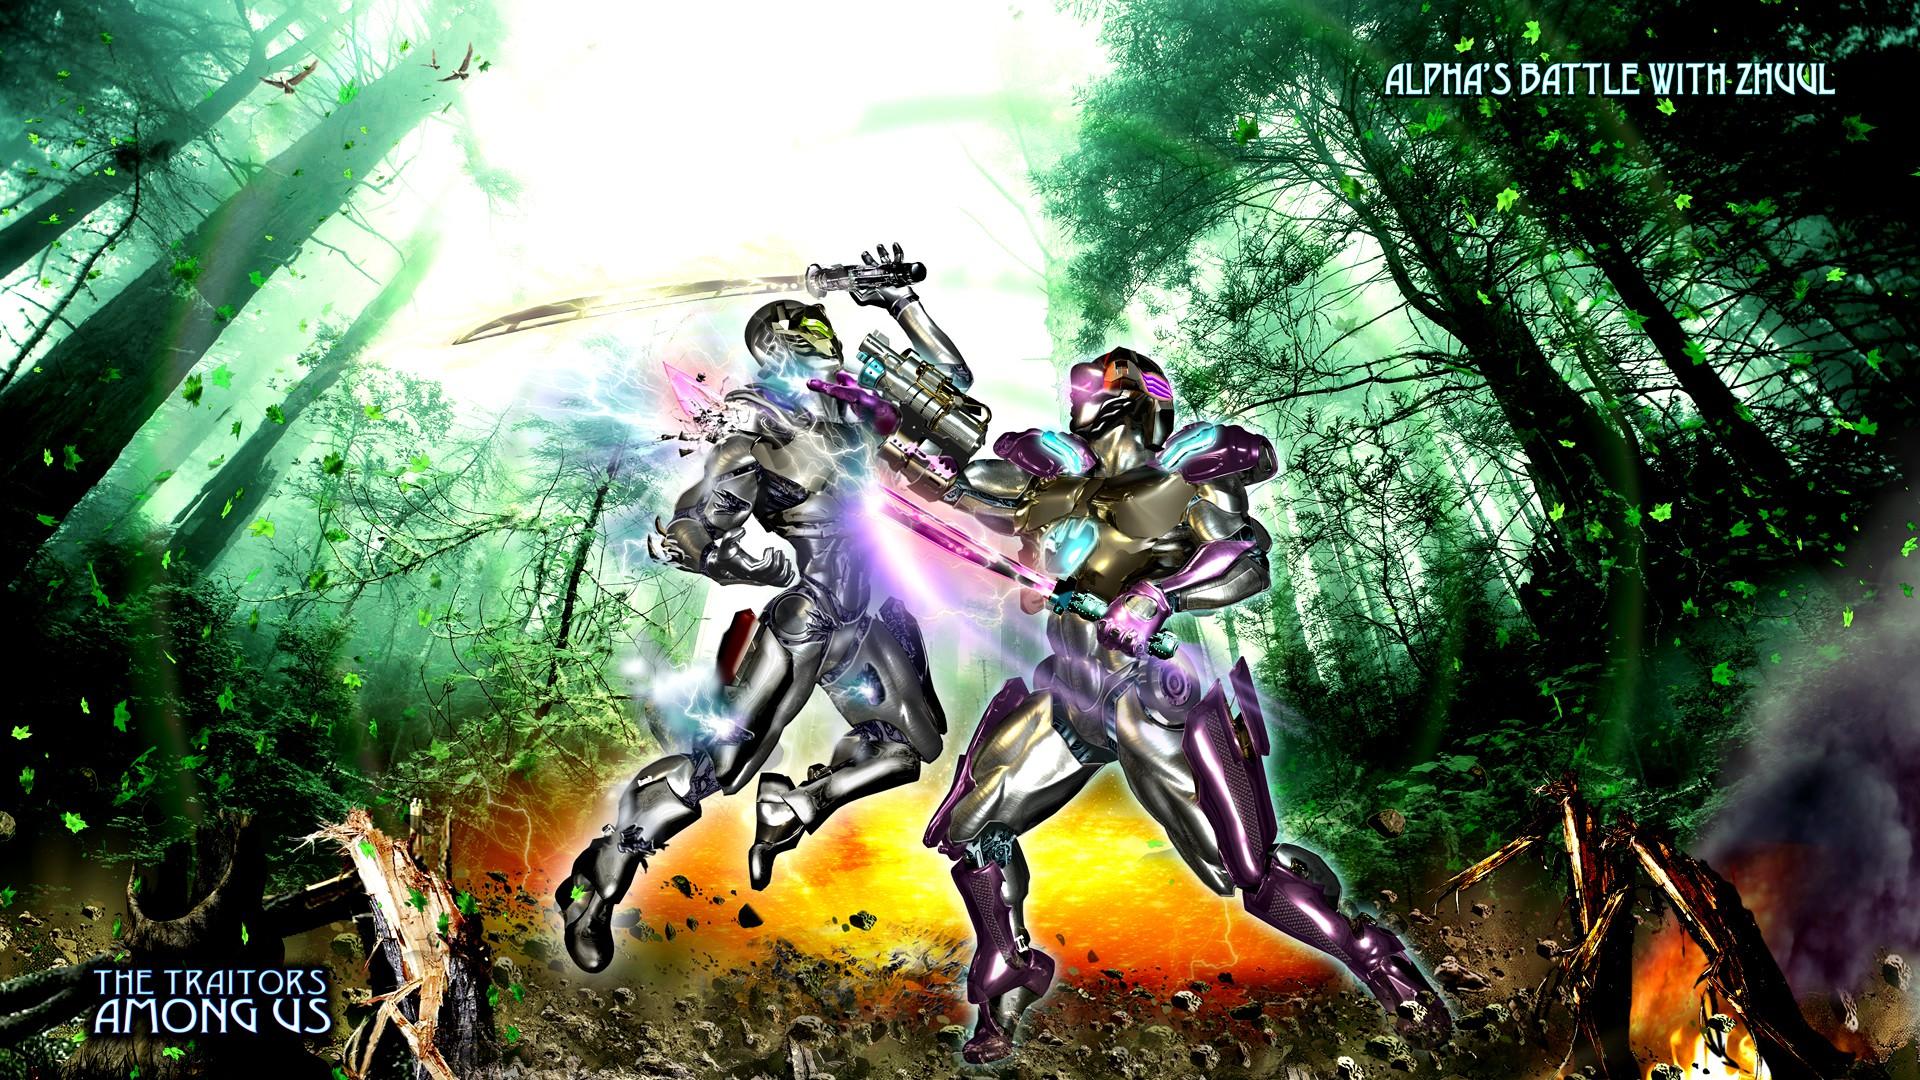 Zyborg Story Universe Concept#2: Fight with Zyborg Zhuul & Alpha